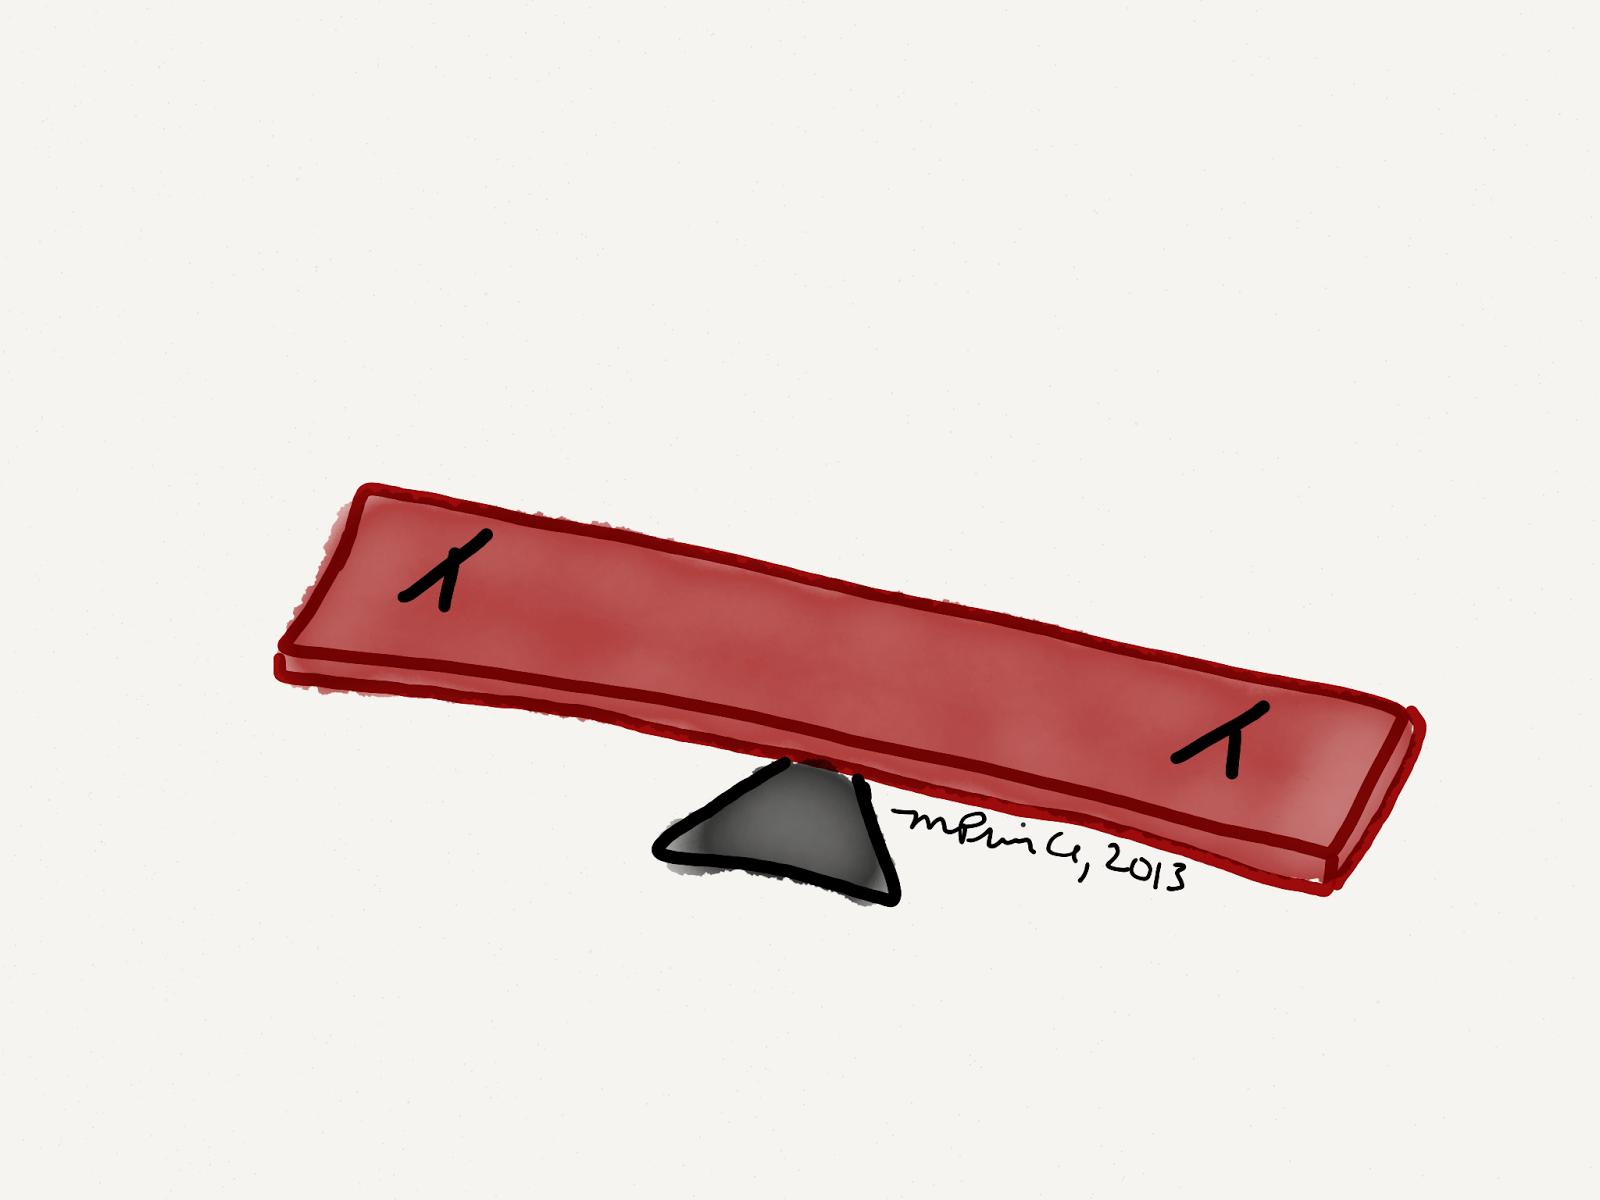 simple machine seesaw